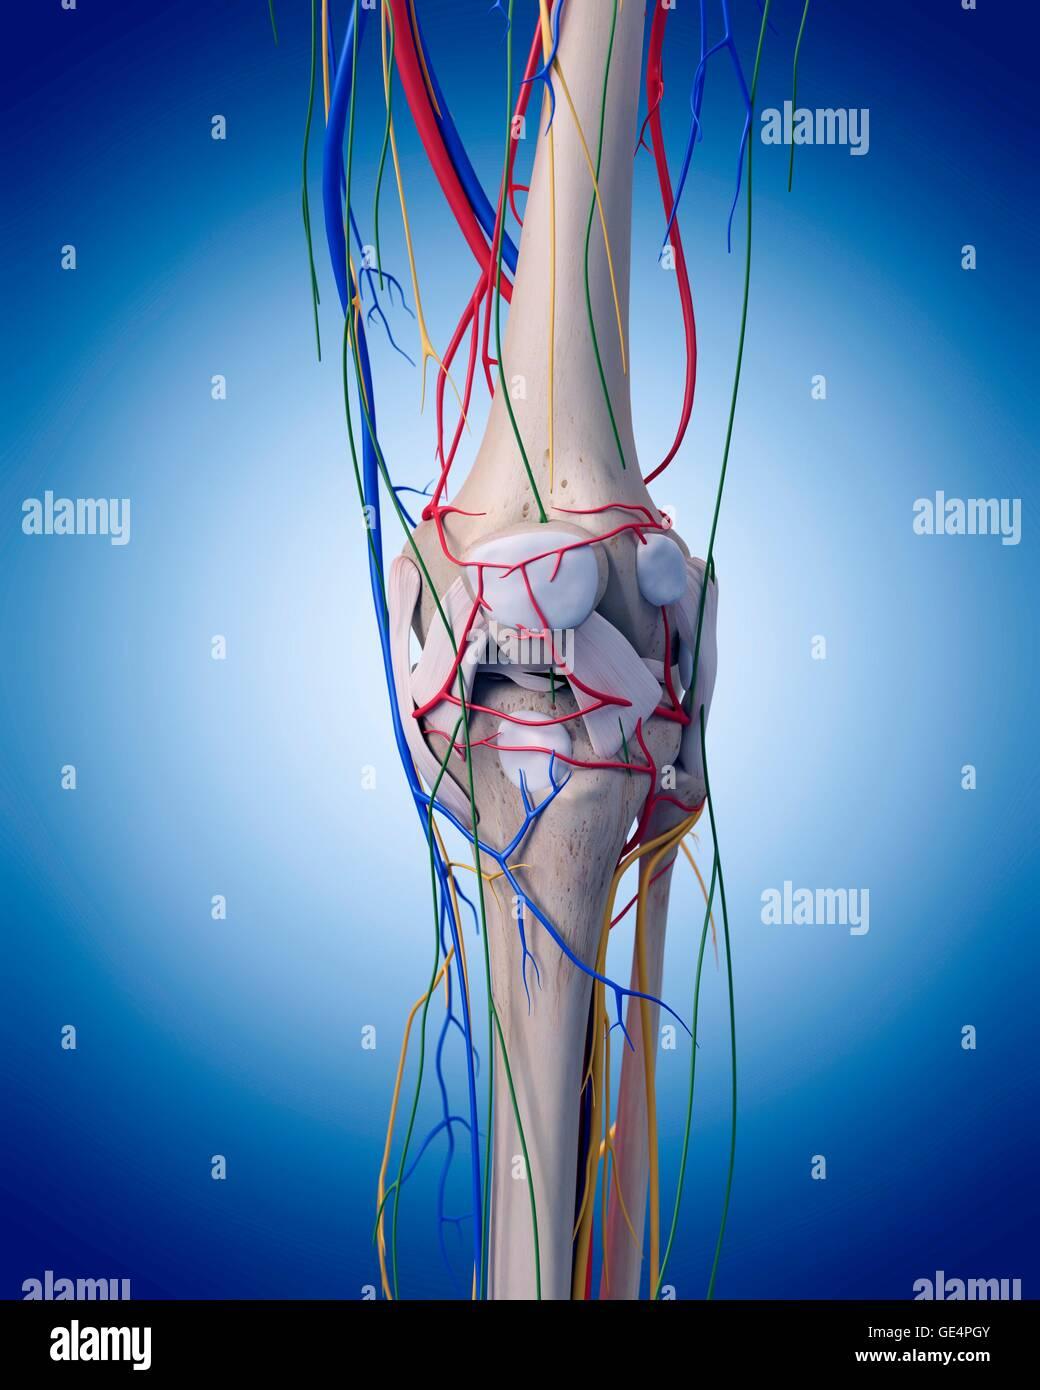 Nerves Knee Stock Photos & Nerves Knee Stock Images - Alamy